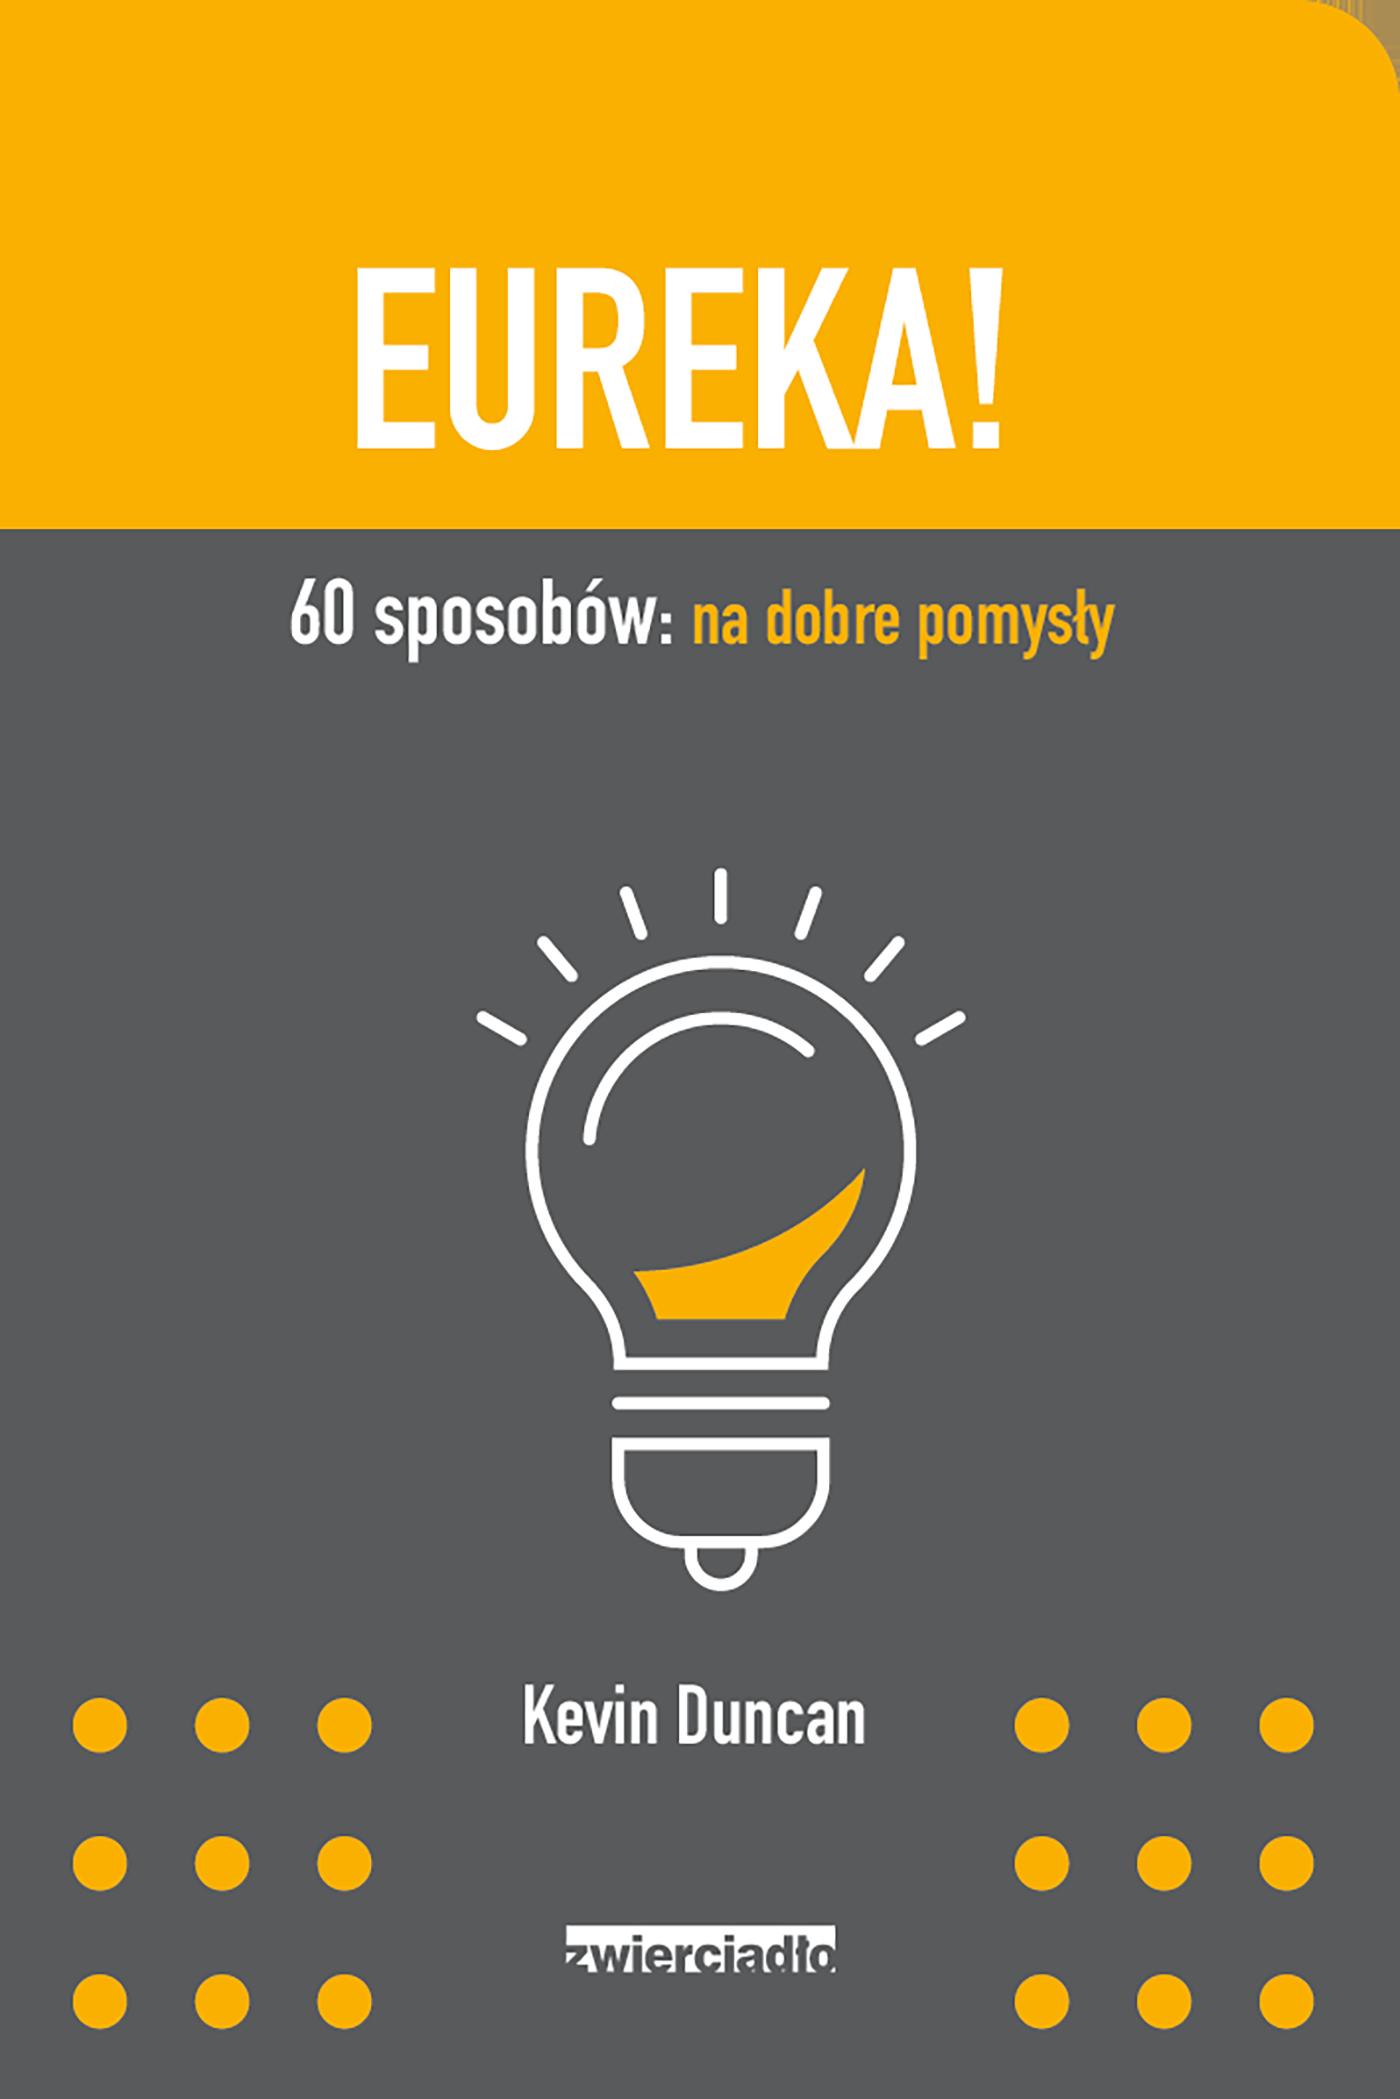 Eureka!. 60 sposobów: na dobre pomysły - Kevin Duncan